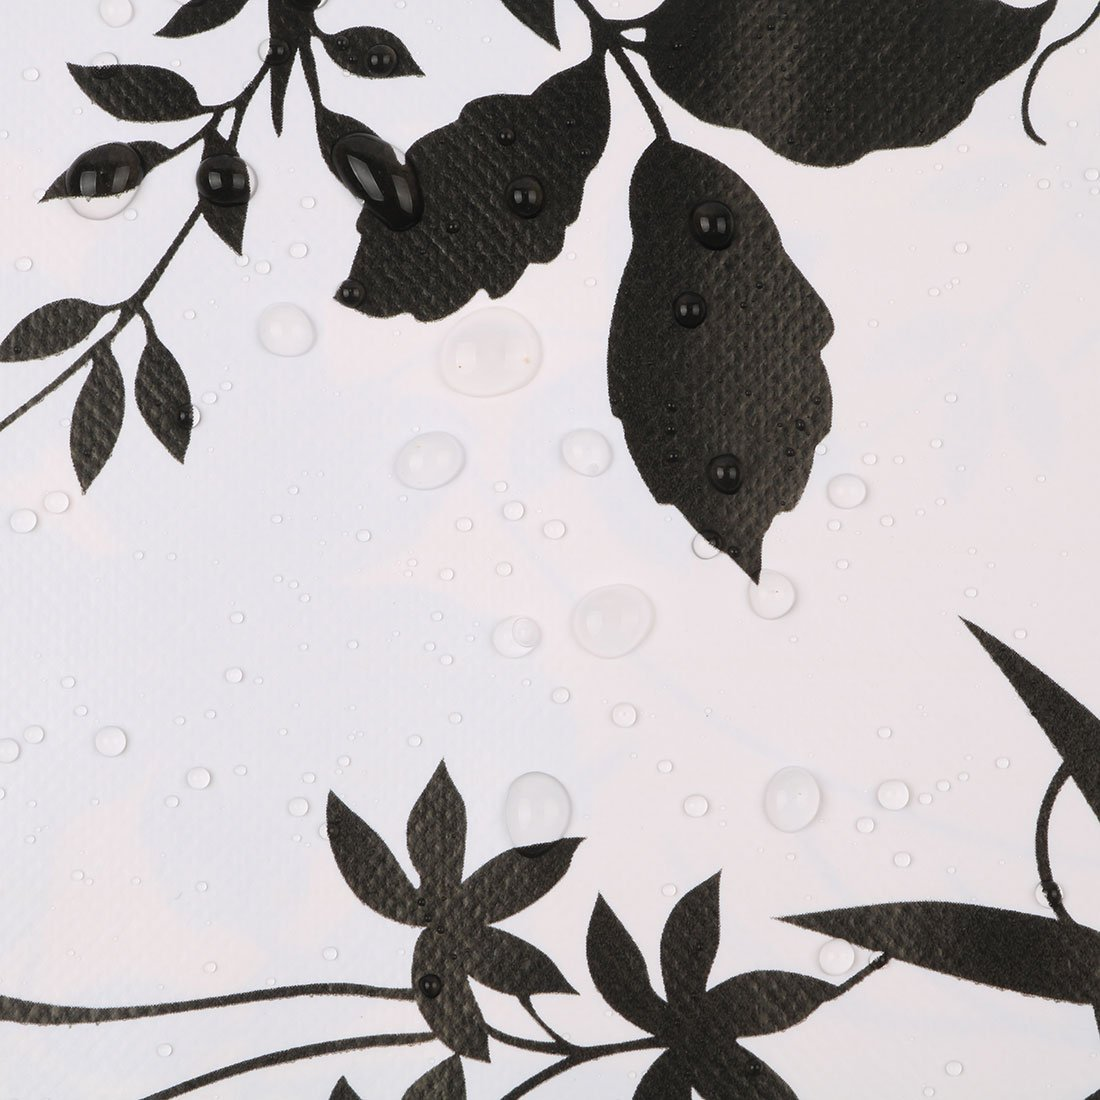 Amazon.com: eDealMax Vinilo Mantel Rectangular Limpiar Limpio Mantel de PVC a prueba de aceite/impermeable resistente a las manchas/a prueba de Moho - 55 x ...